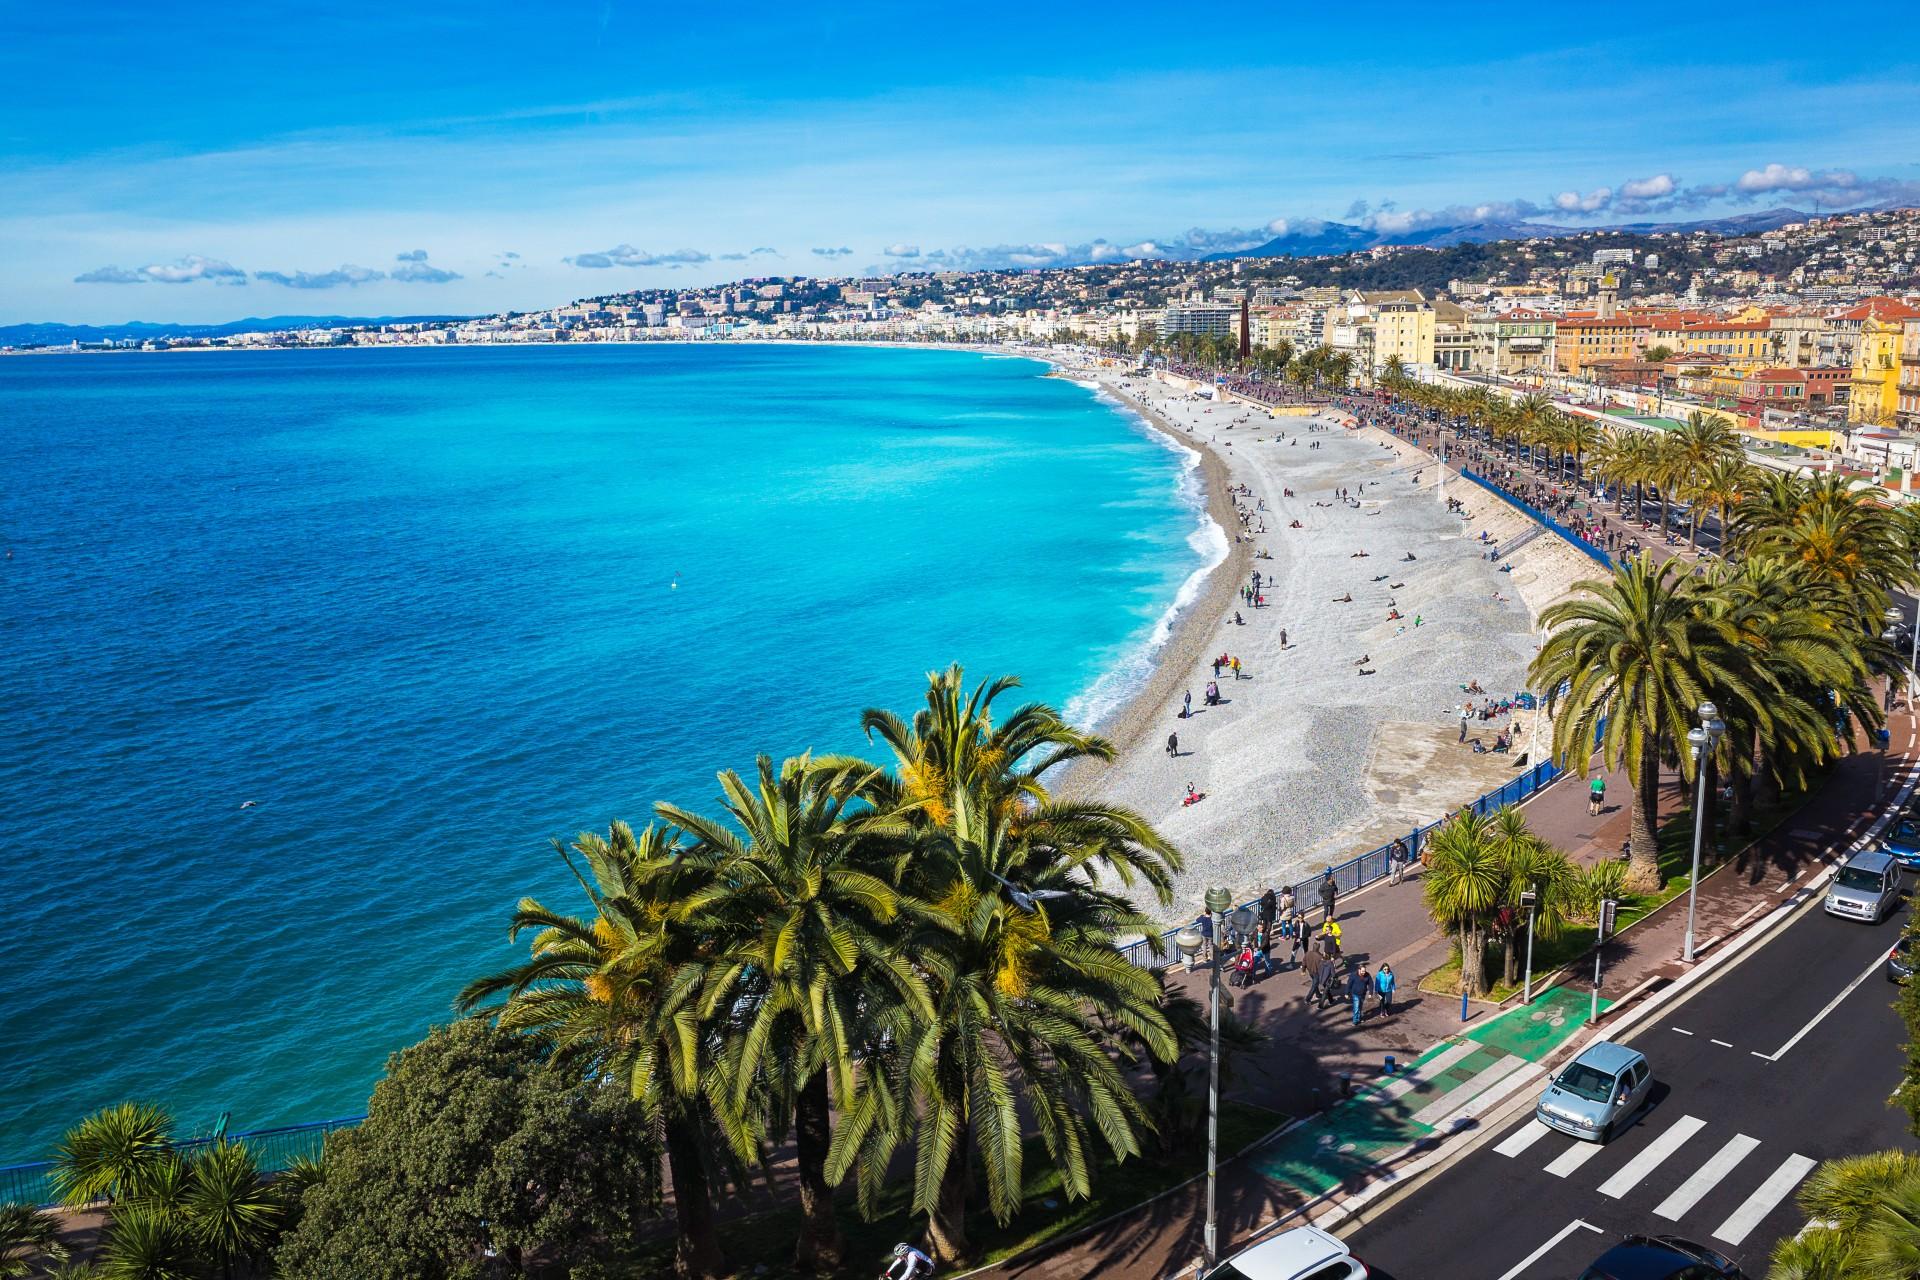 Wofür ist Nizza berühmt?